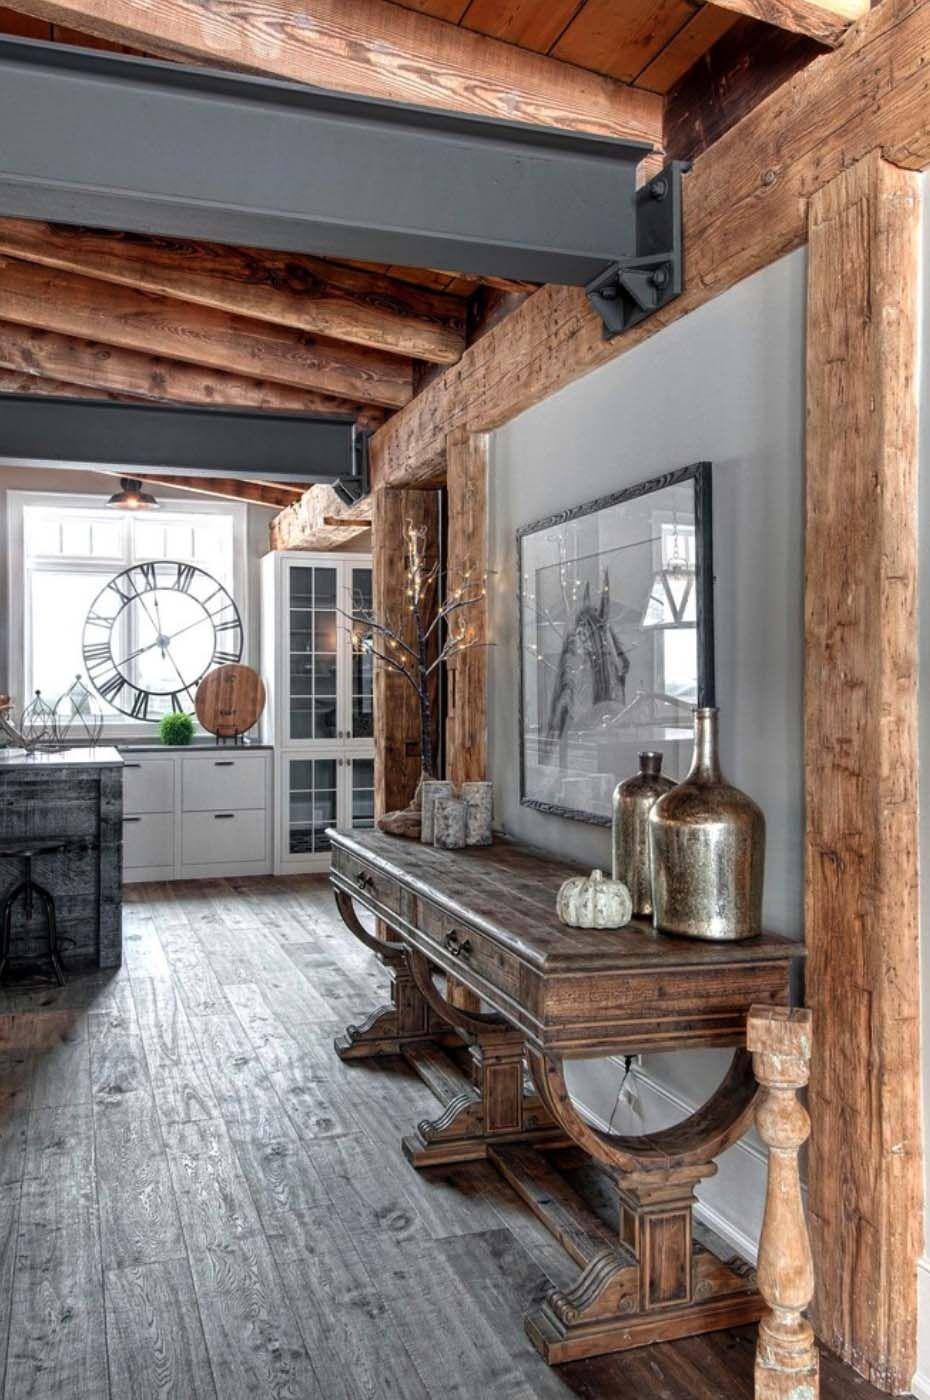 Luxury Canadian Home Reveals Splendid Rustic-modern